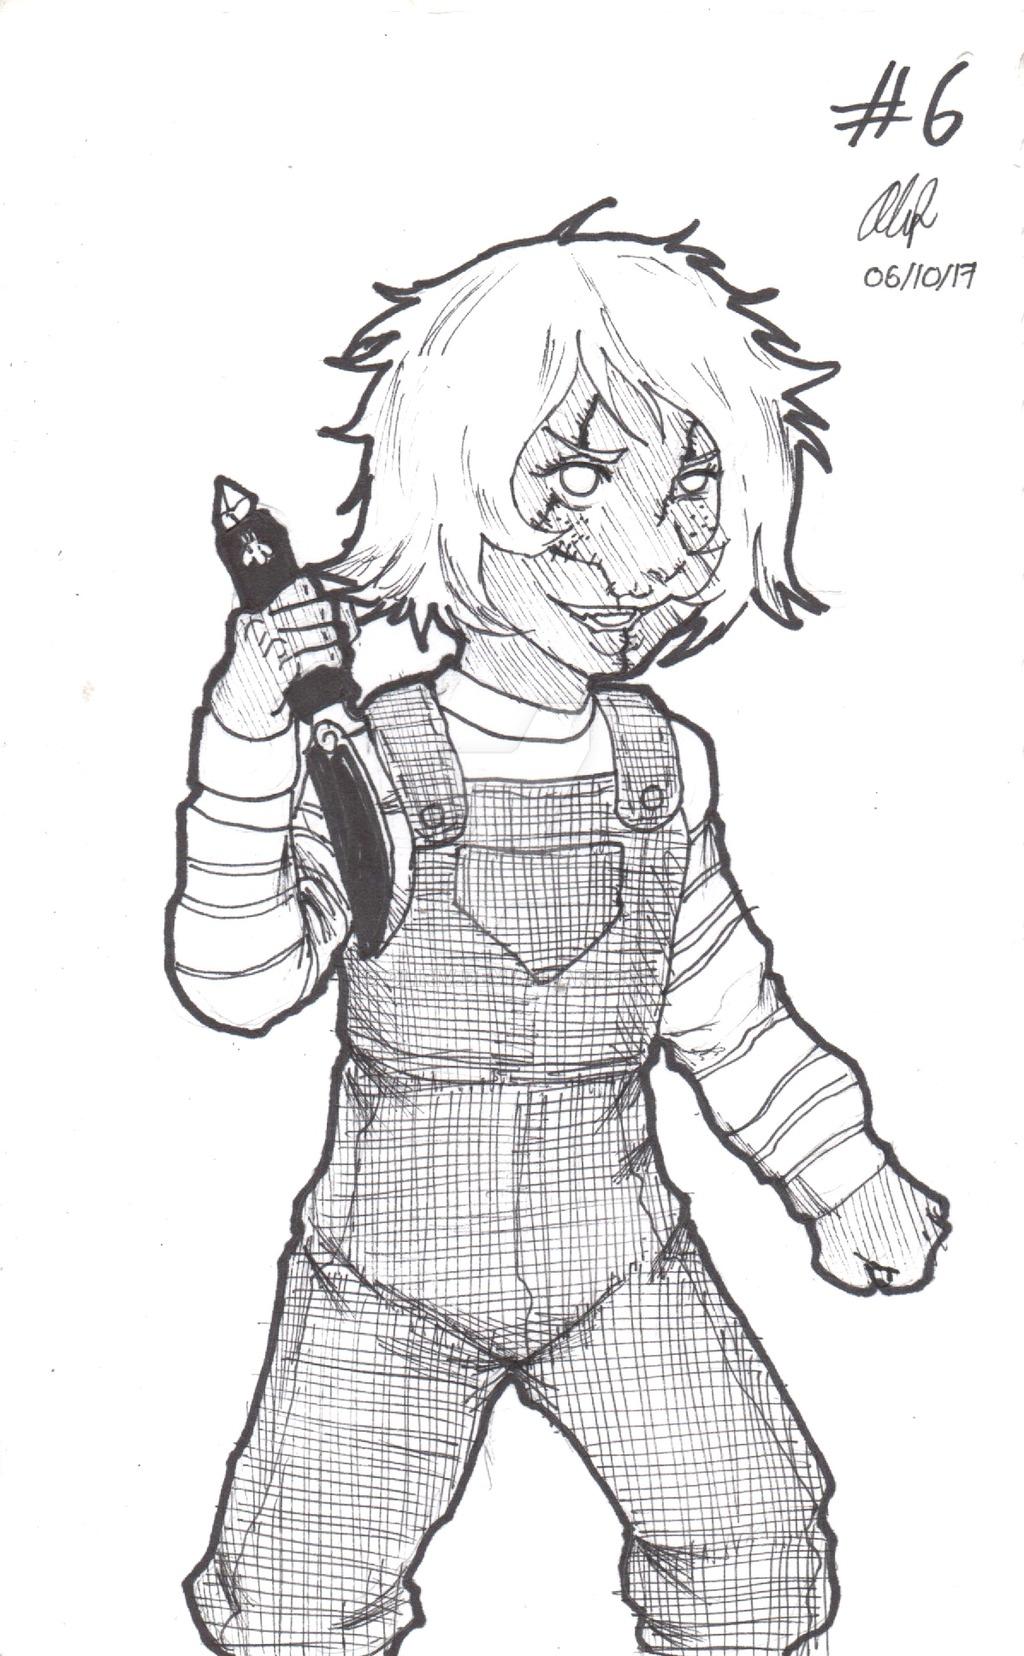 1024x1656 Inktober 2017 6 Kid Amethyst As Chucky By Oliriv